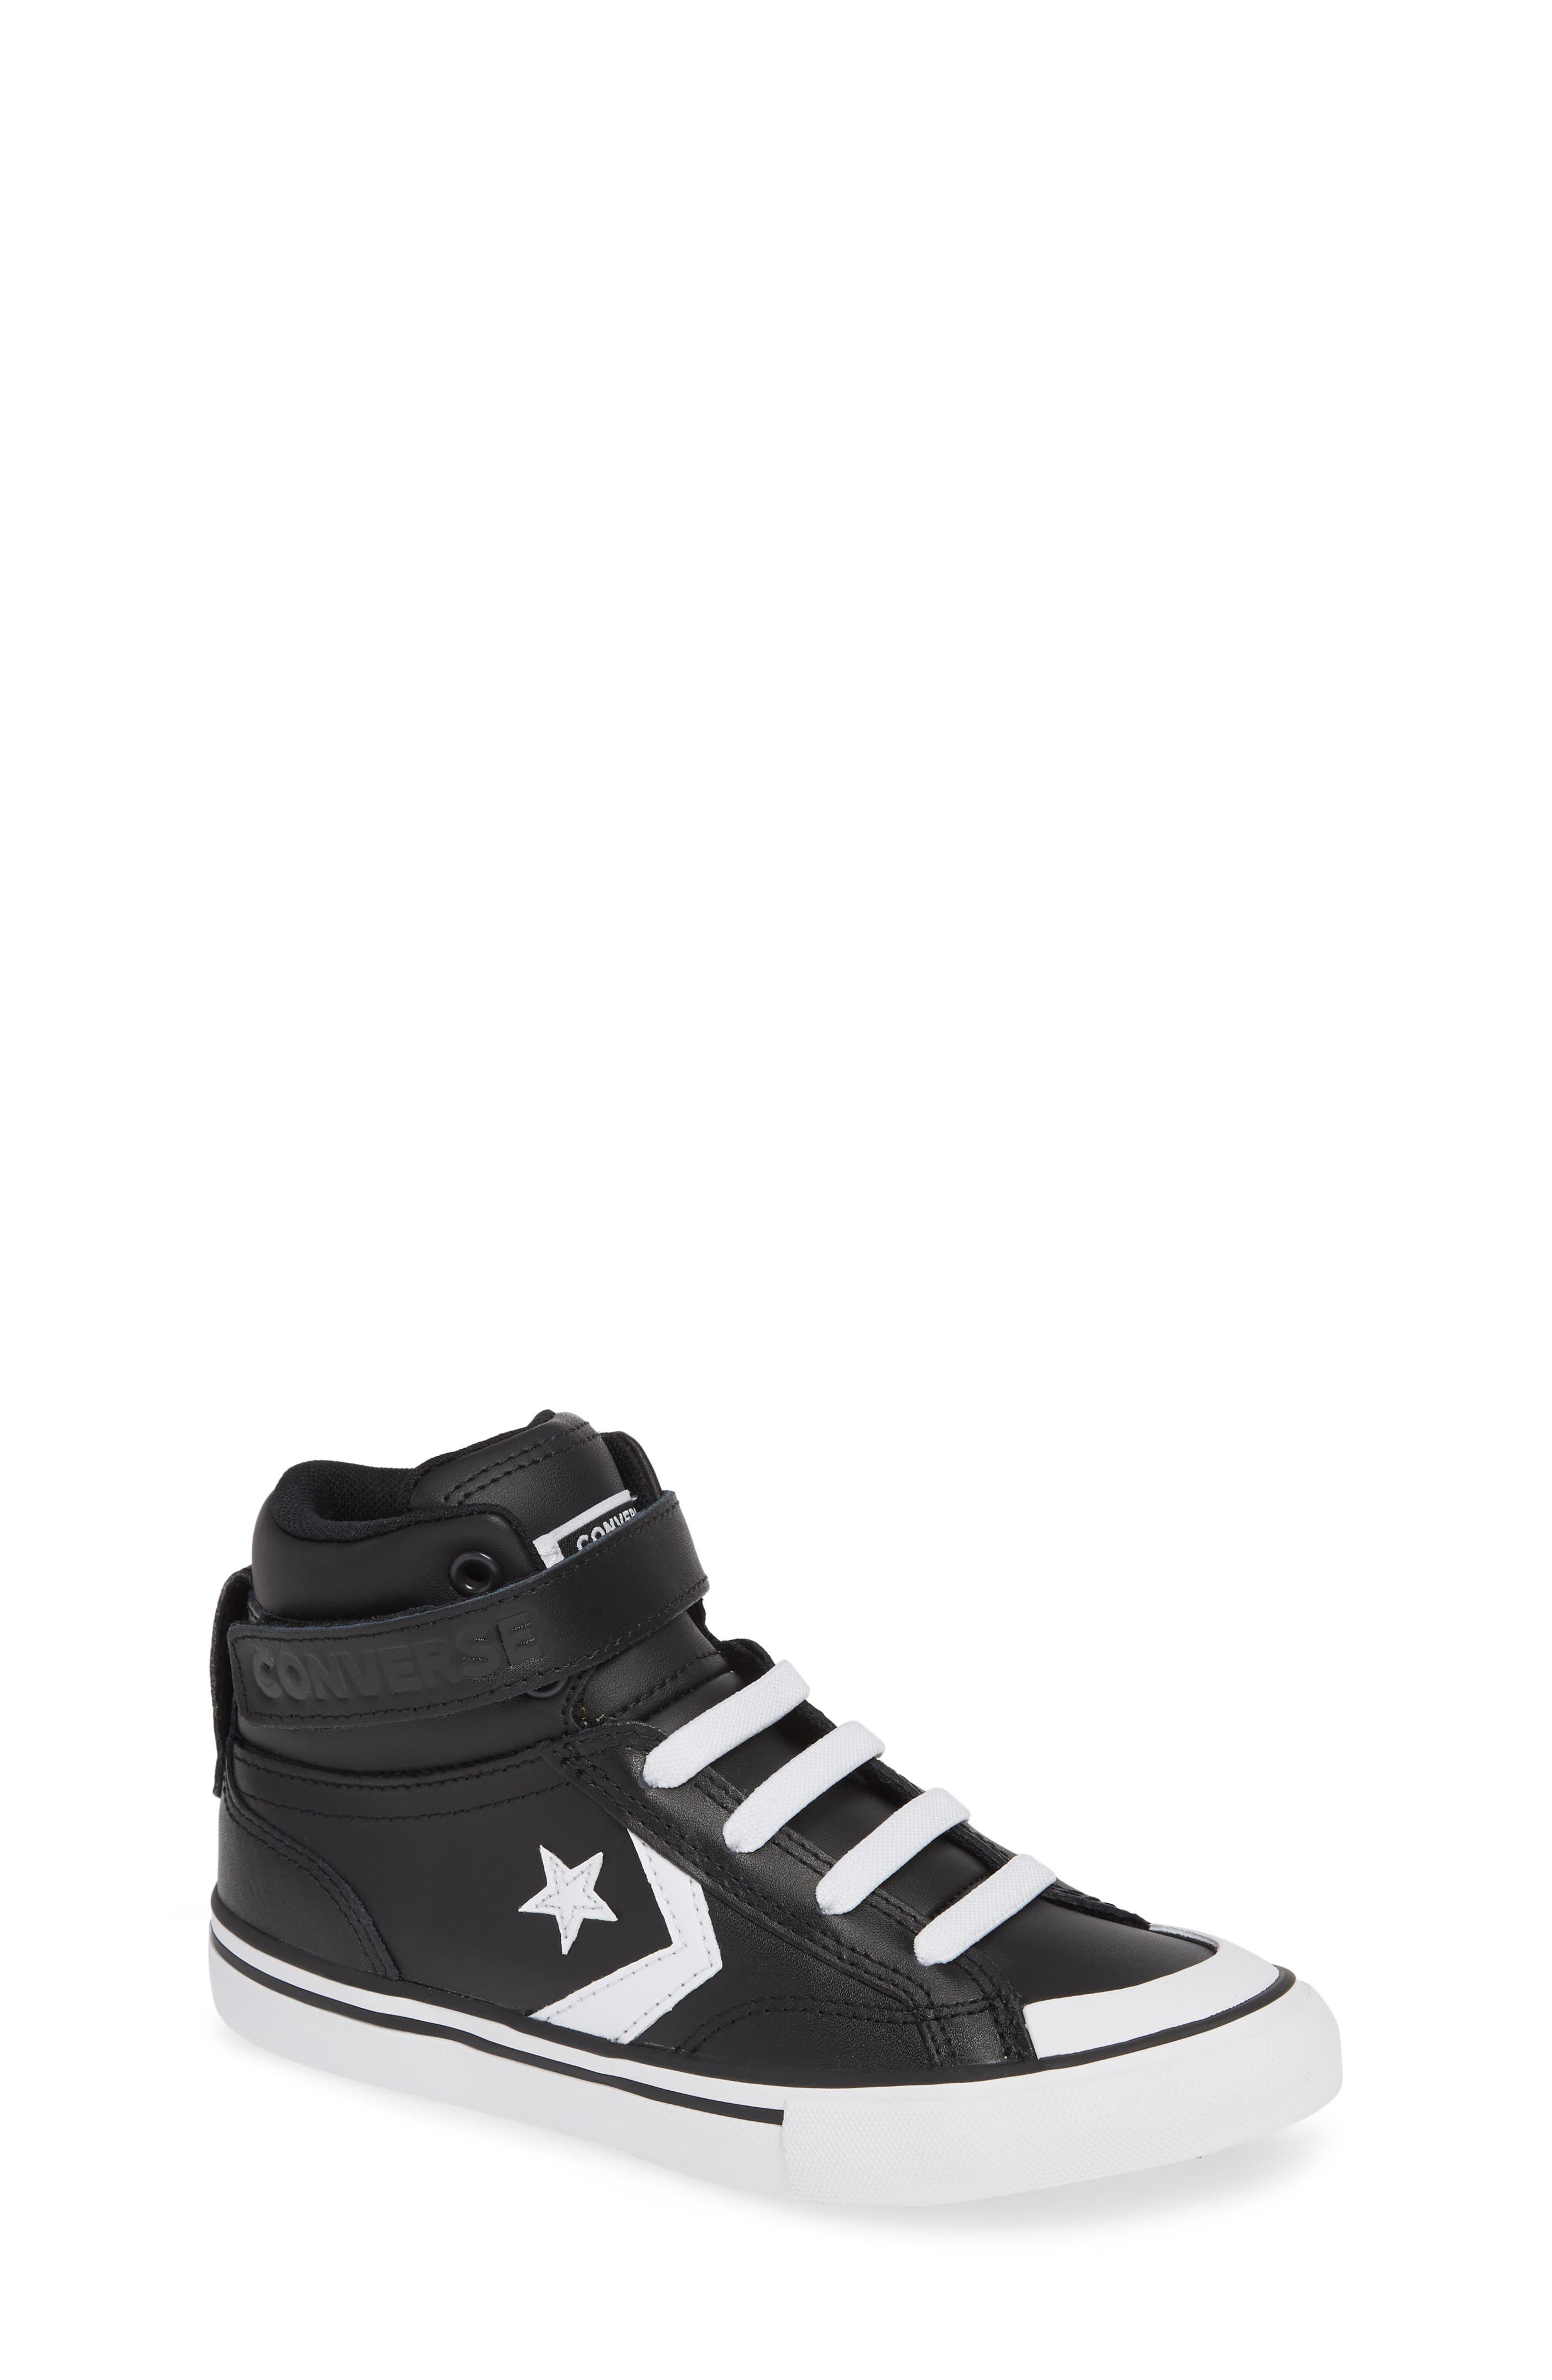 CONVERSE, Pro Blaze High Top Sneaker, Main thumbnail 1, color, BLACK/ WHITE/ WHITE